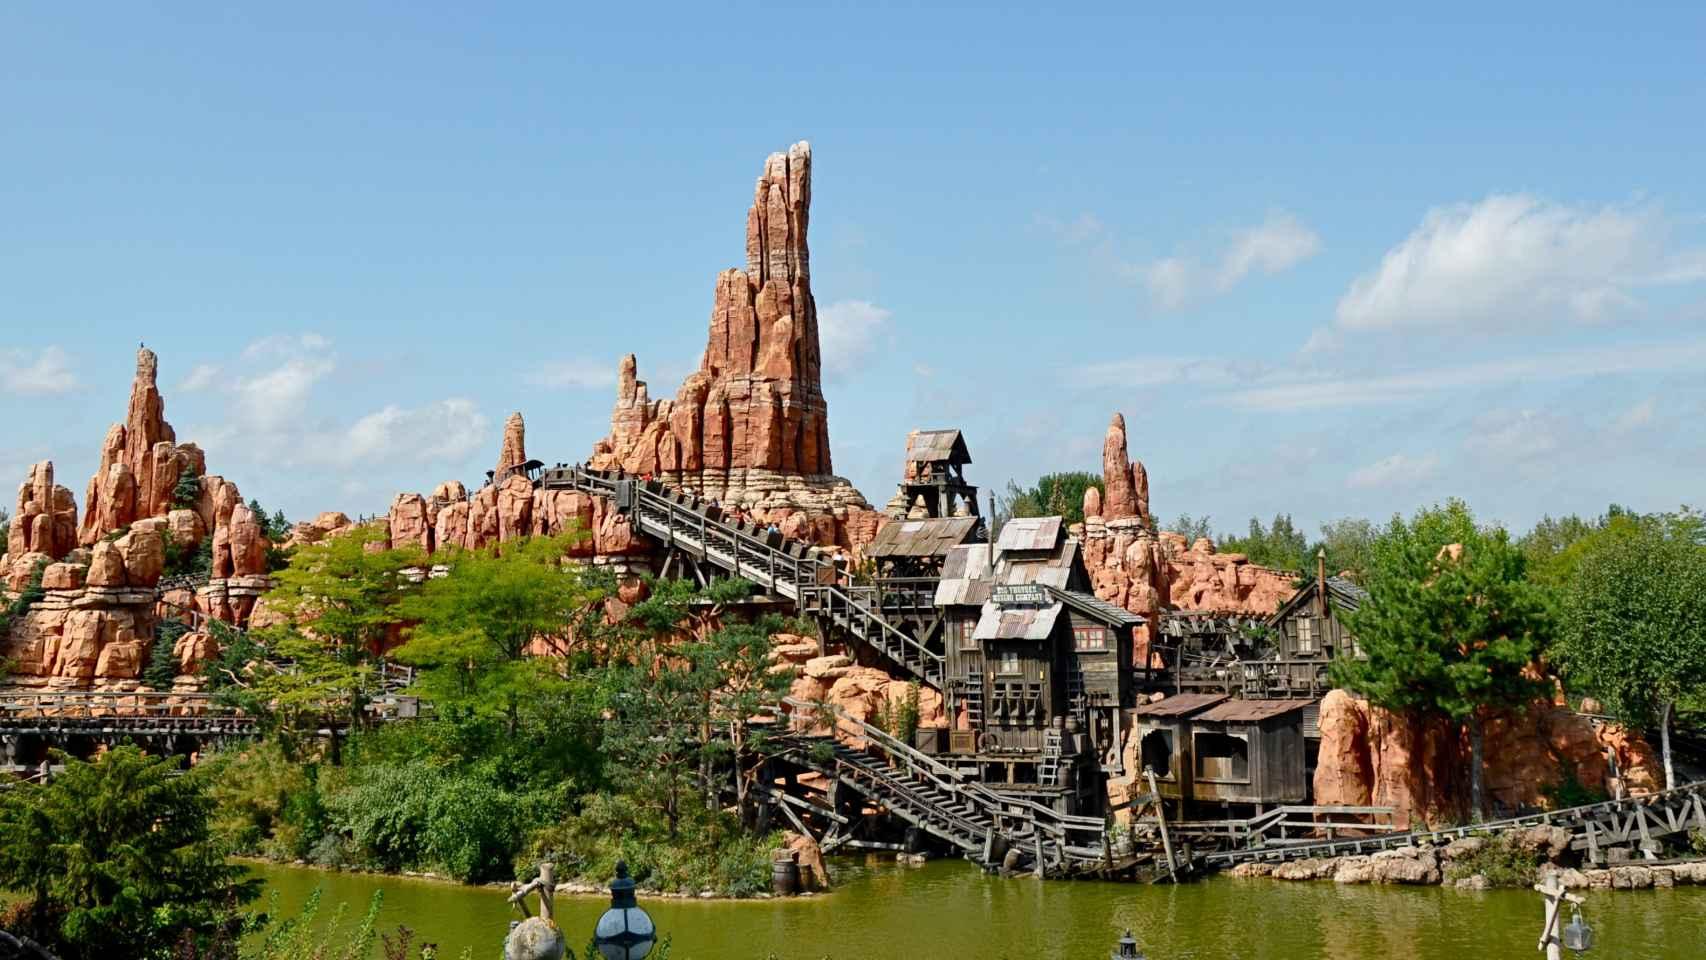 La Big Thunder Mountain de Disneyland.